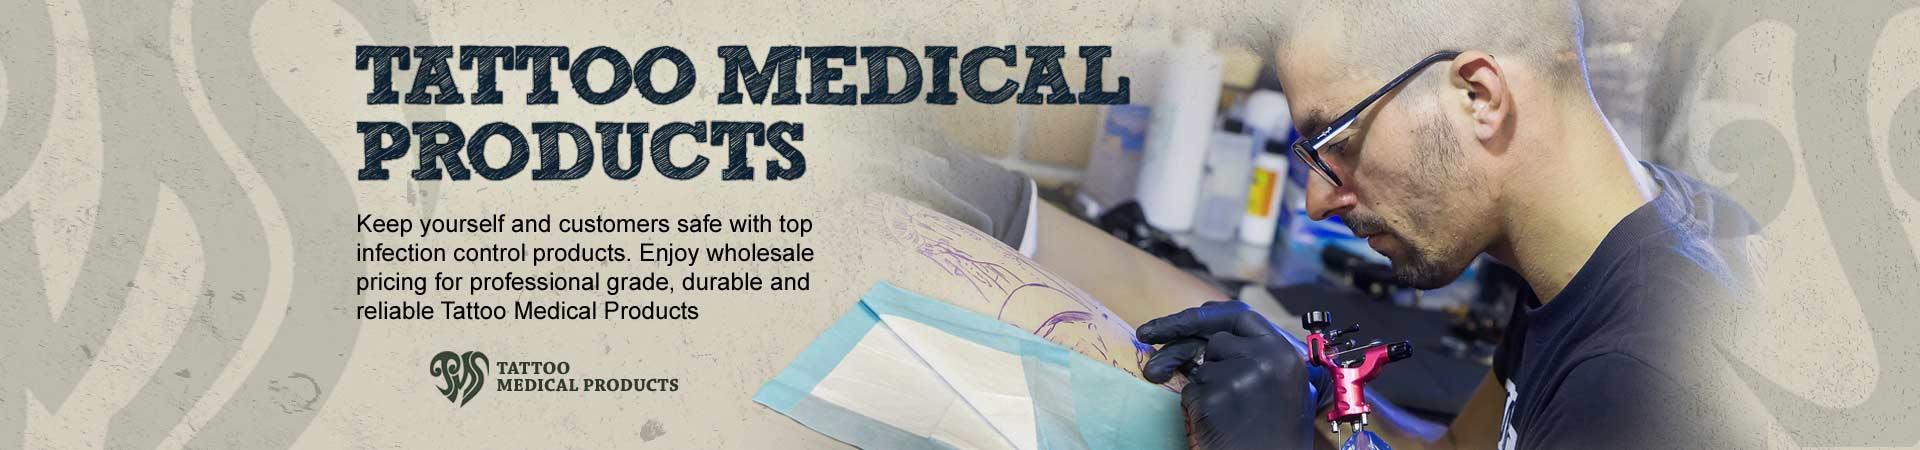 Tattoo Medical Supplies